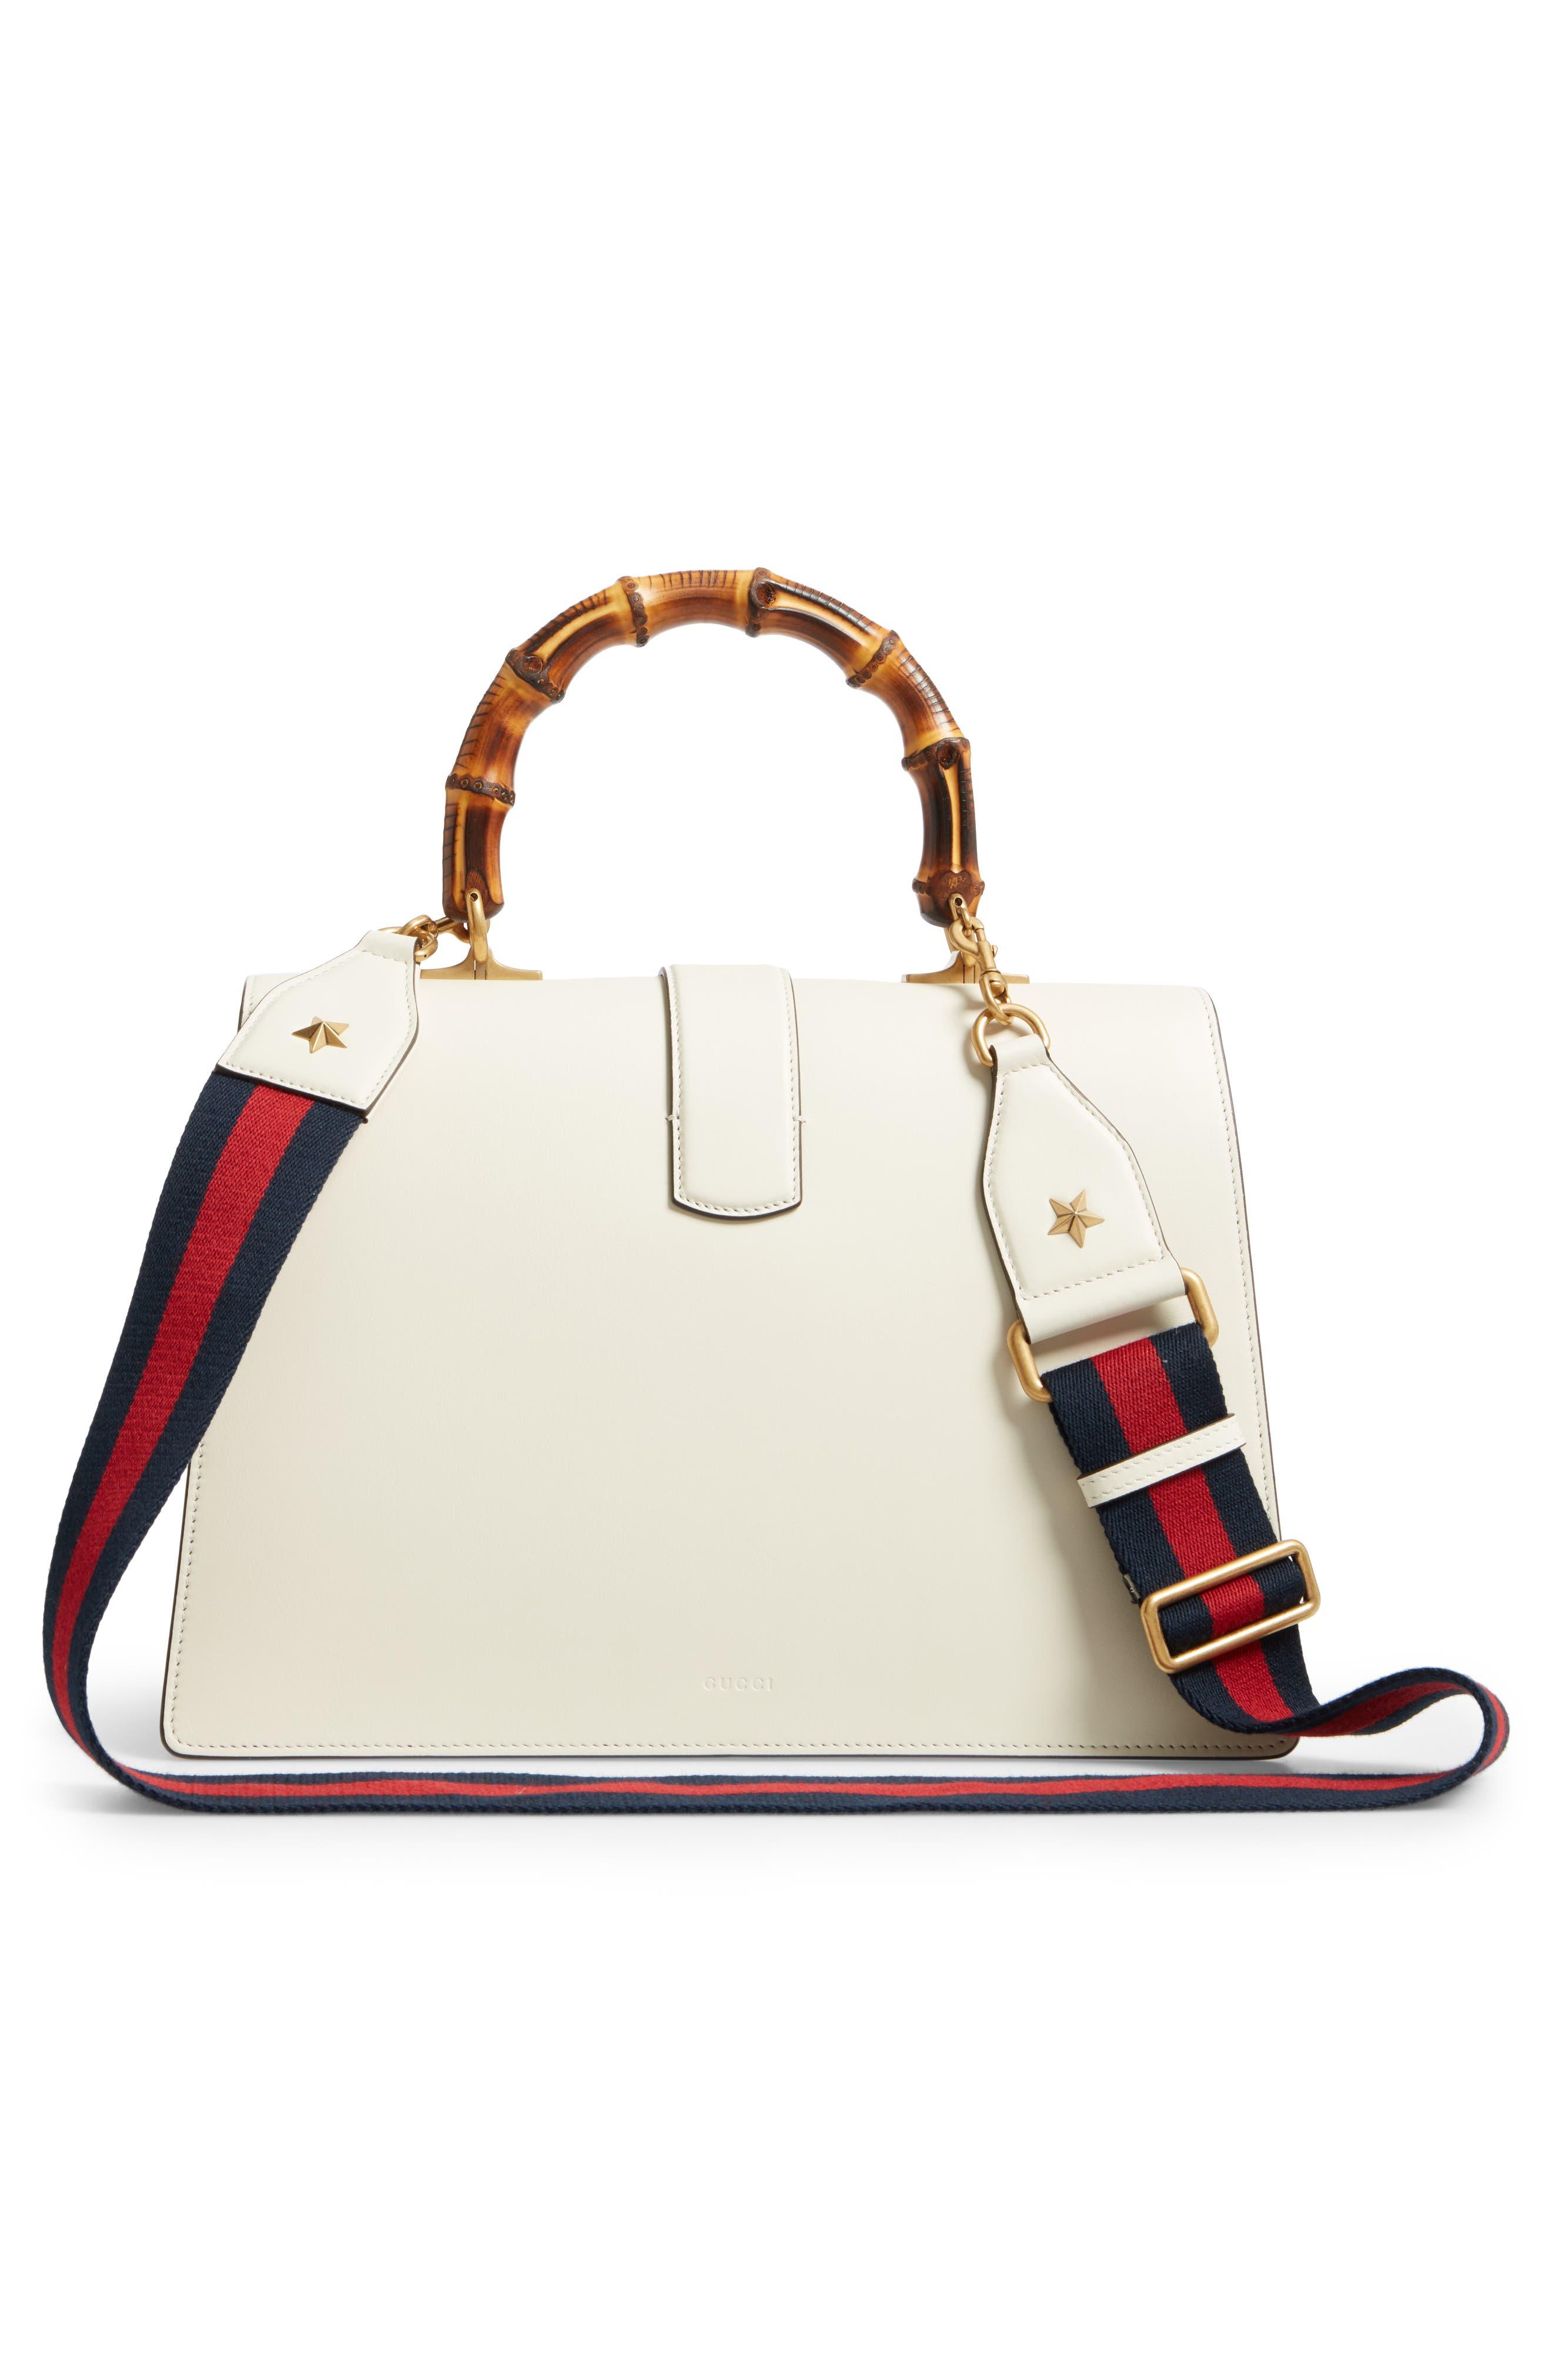 GUCCI, Large Dionysus Top Handle Leather Shoulder Bag, Alternate thumbnail 3, color, MYSTIC WHITE/ BLUE/ RED